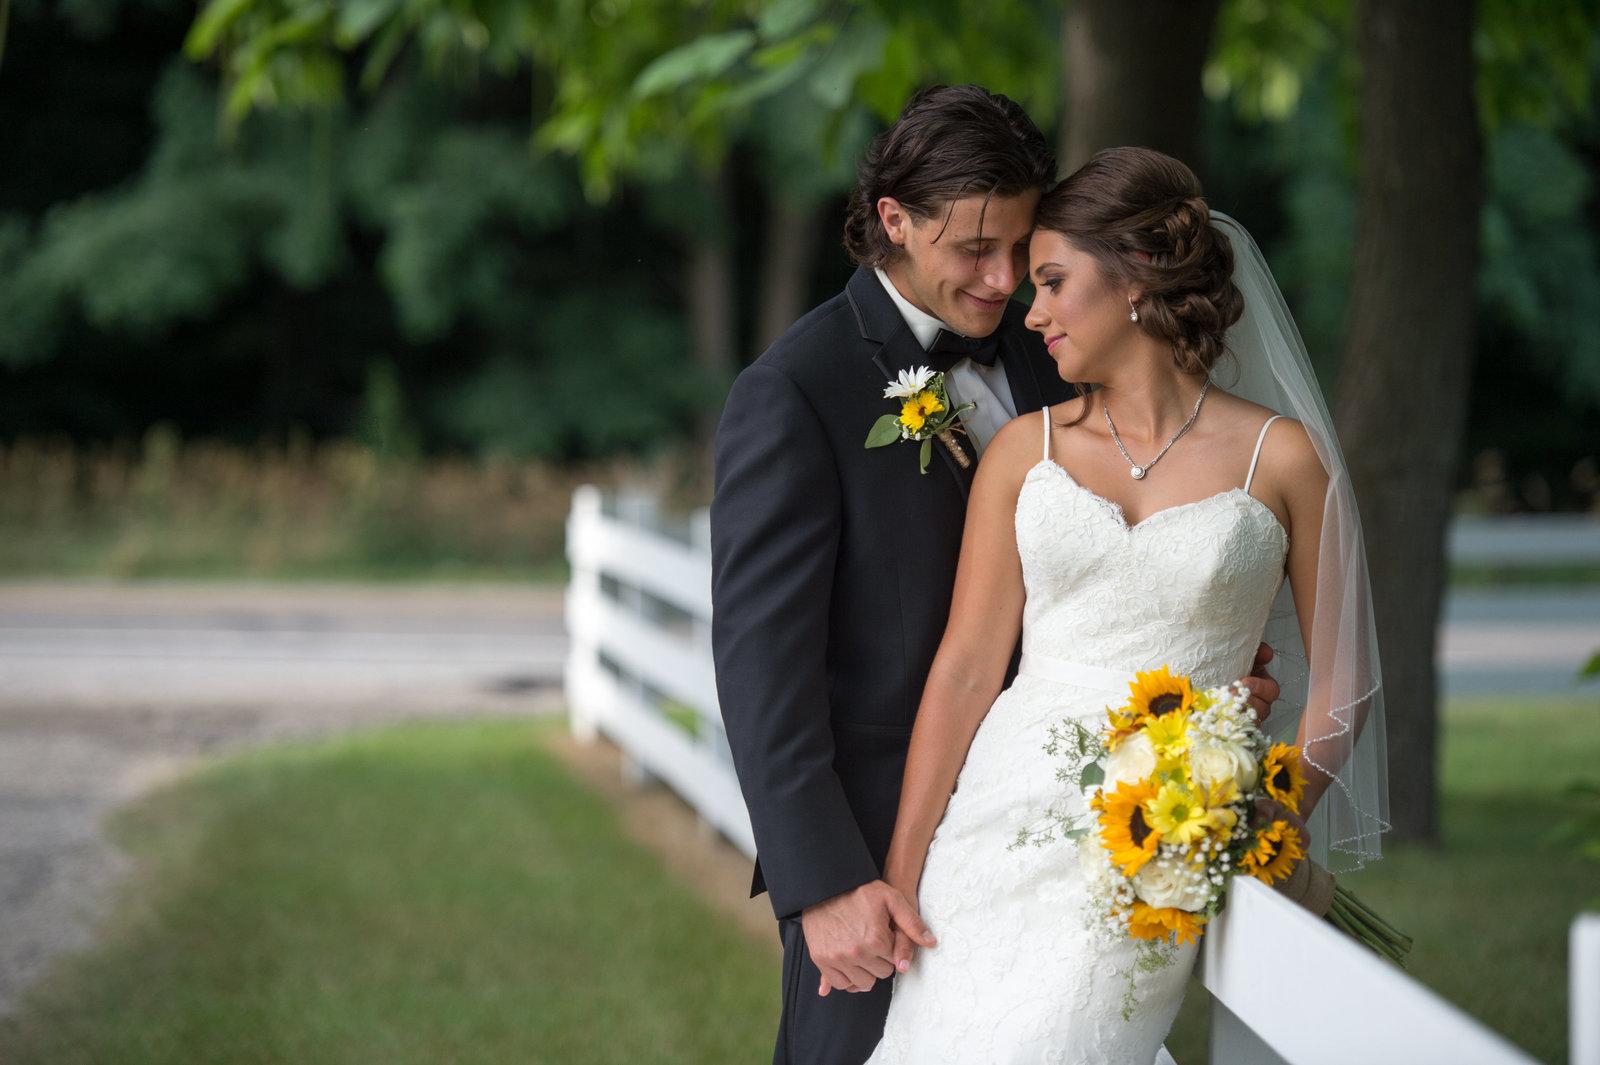 Chase and pauline wedding